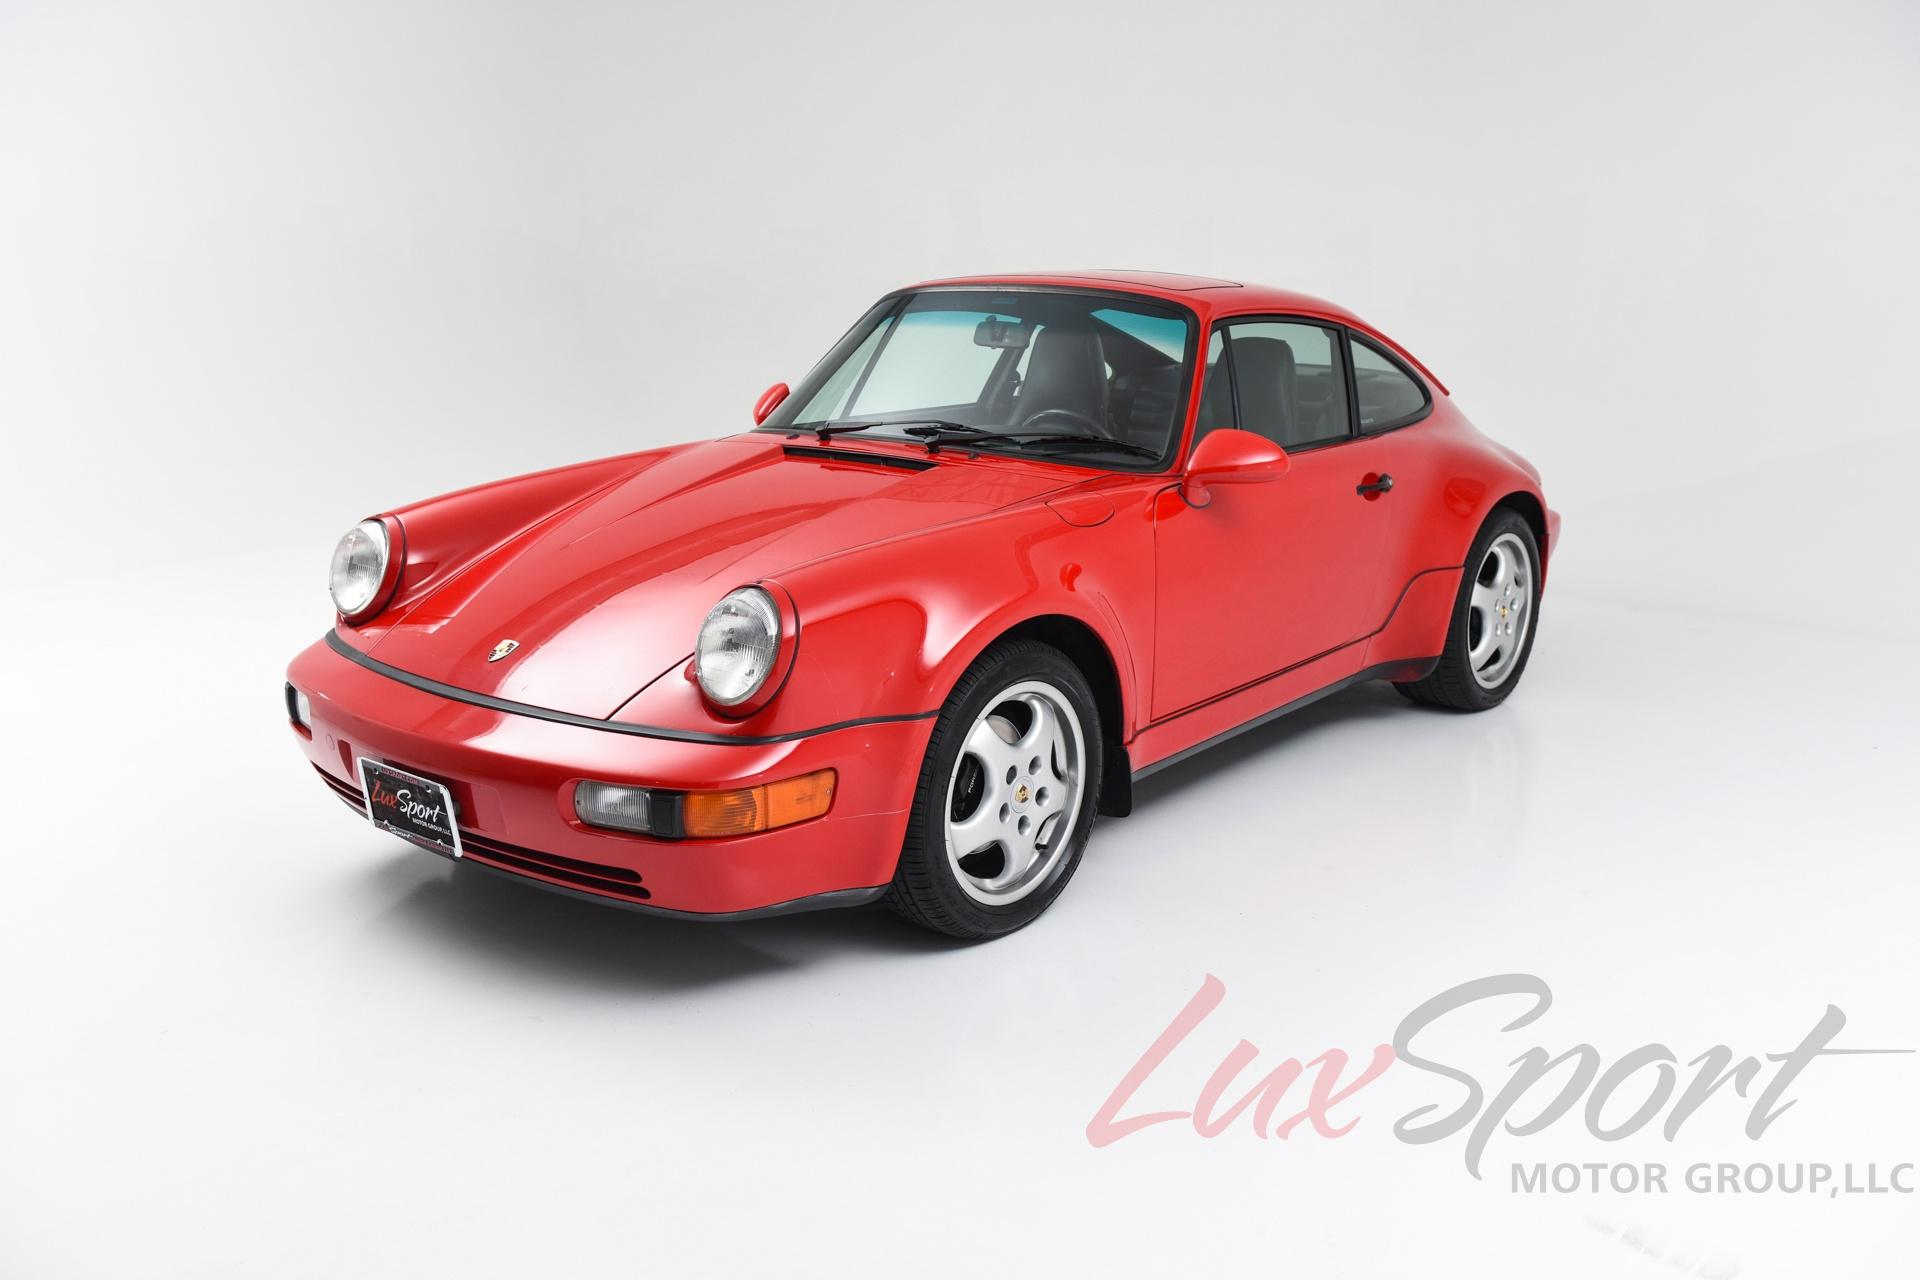 1994 Porsche 964 Carrera 4 Widebody Coupe Stock 1994107